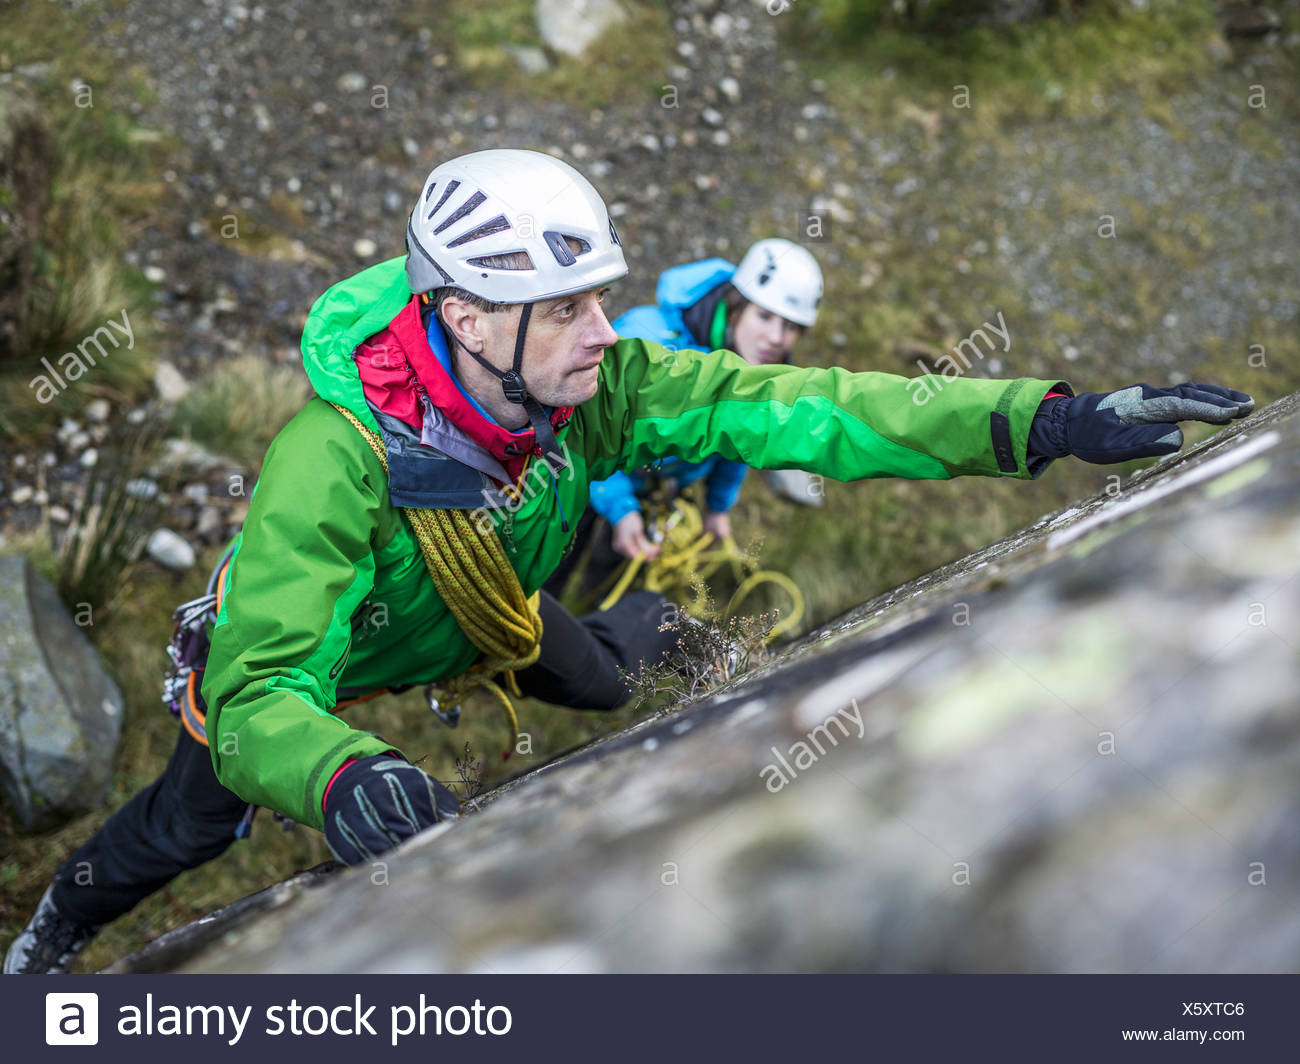 Escalador escalar roca empinada Imagen De Stock